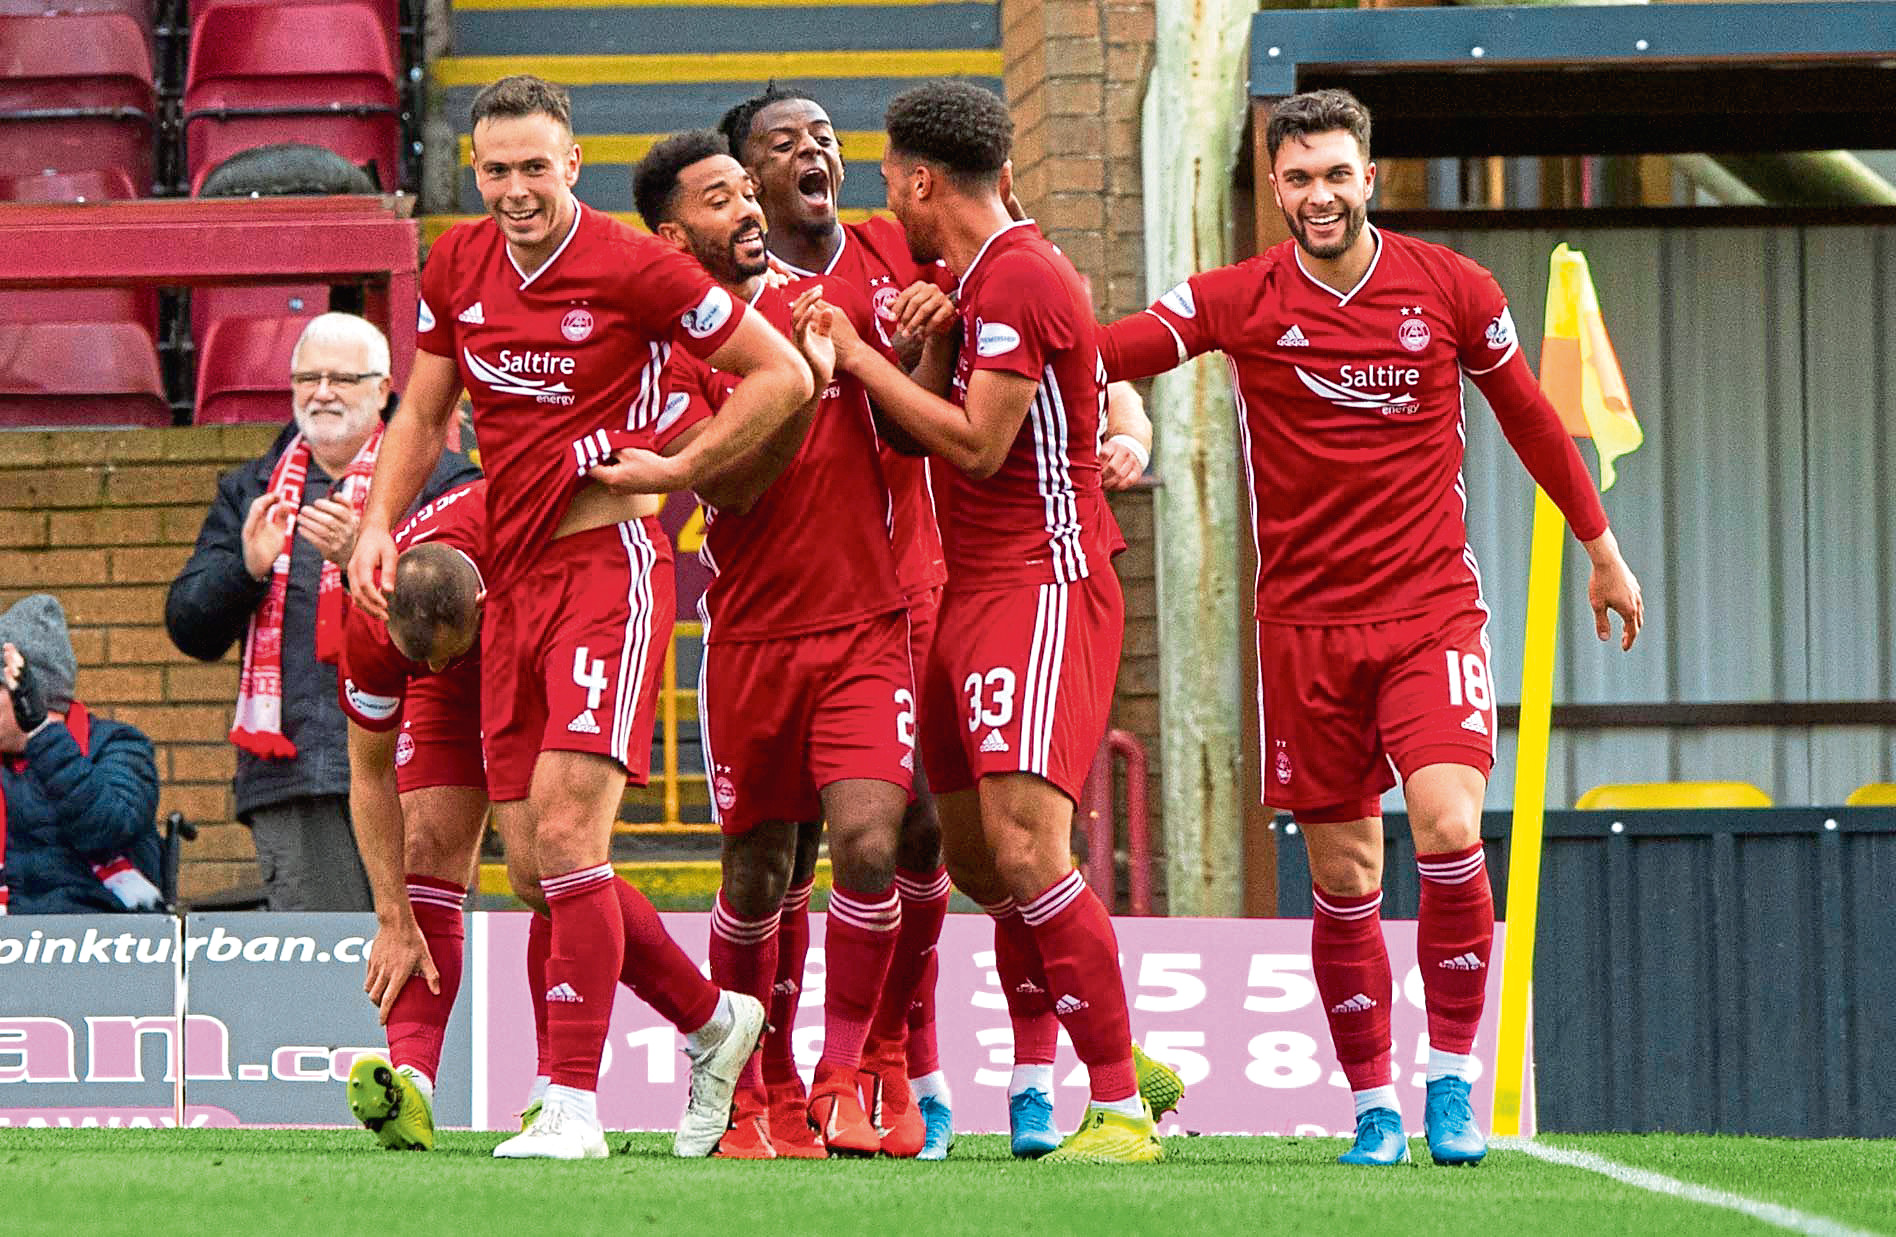 Zak Vyner celebrates his goal with his team mates.